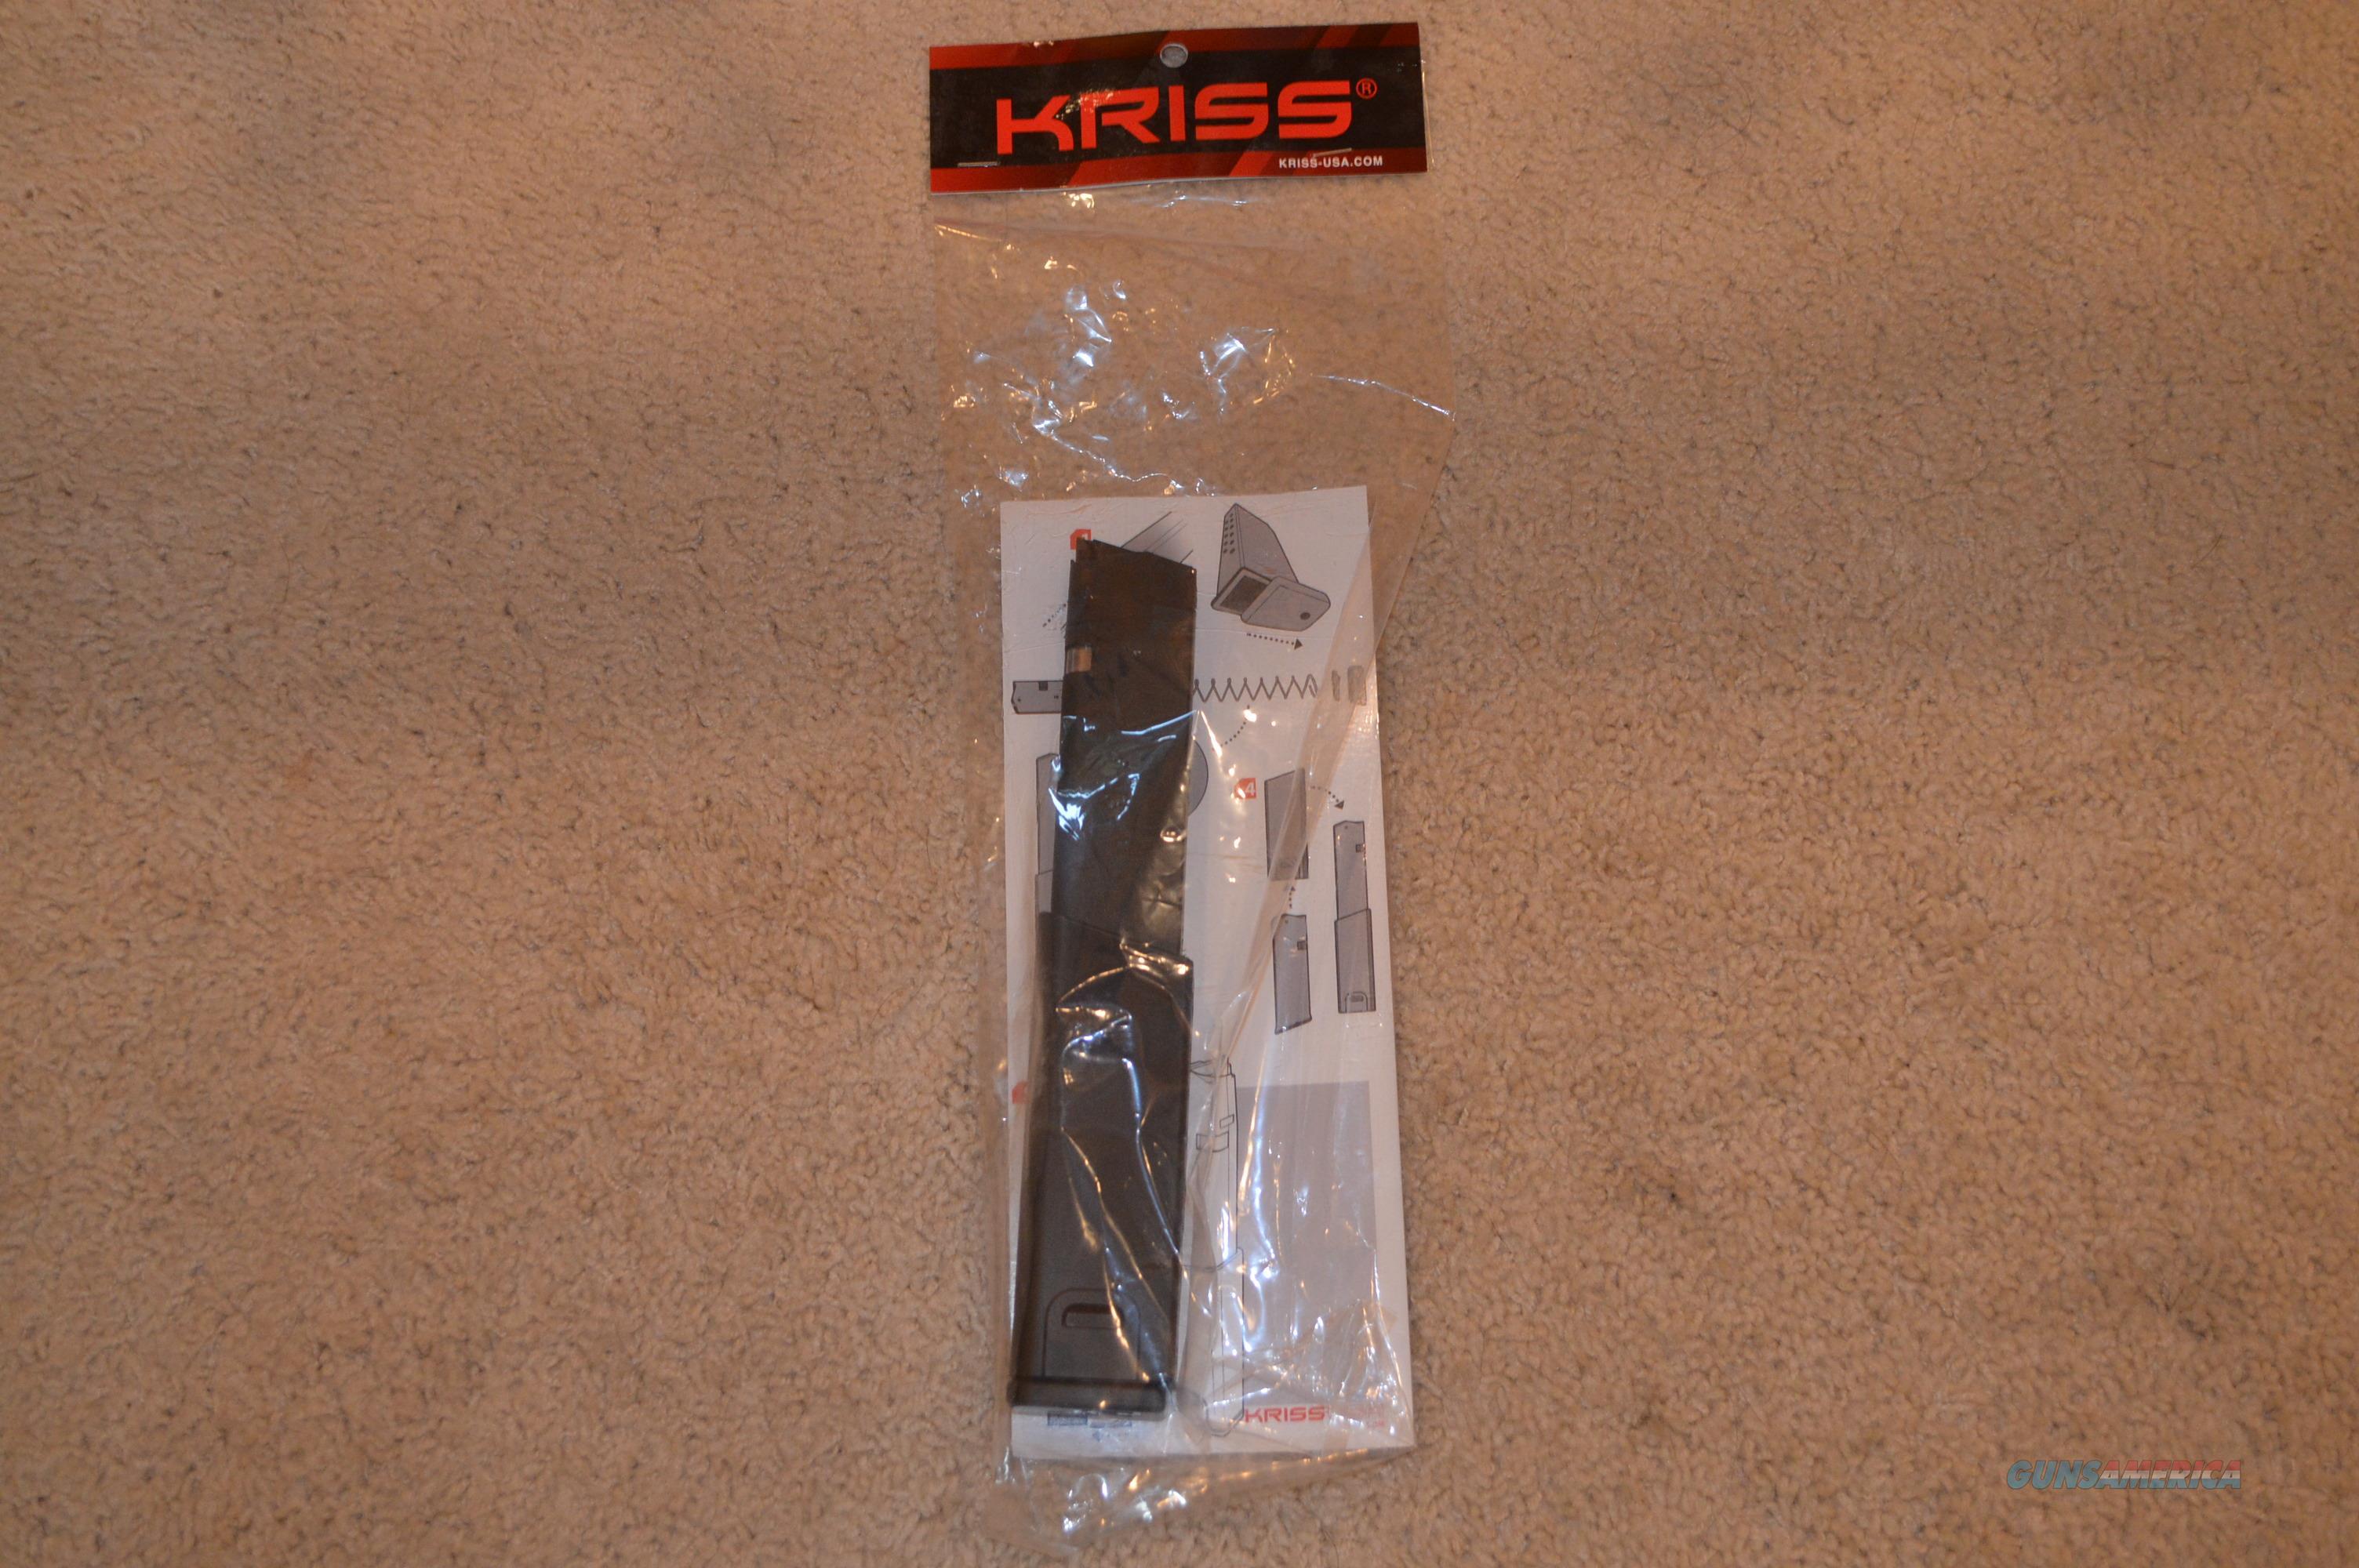 Kriss G25 Mag 25 Round 45acp Glock Free Ship!  Non-Guns > Magazines & Clips > Rifle Magazines > Other